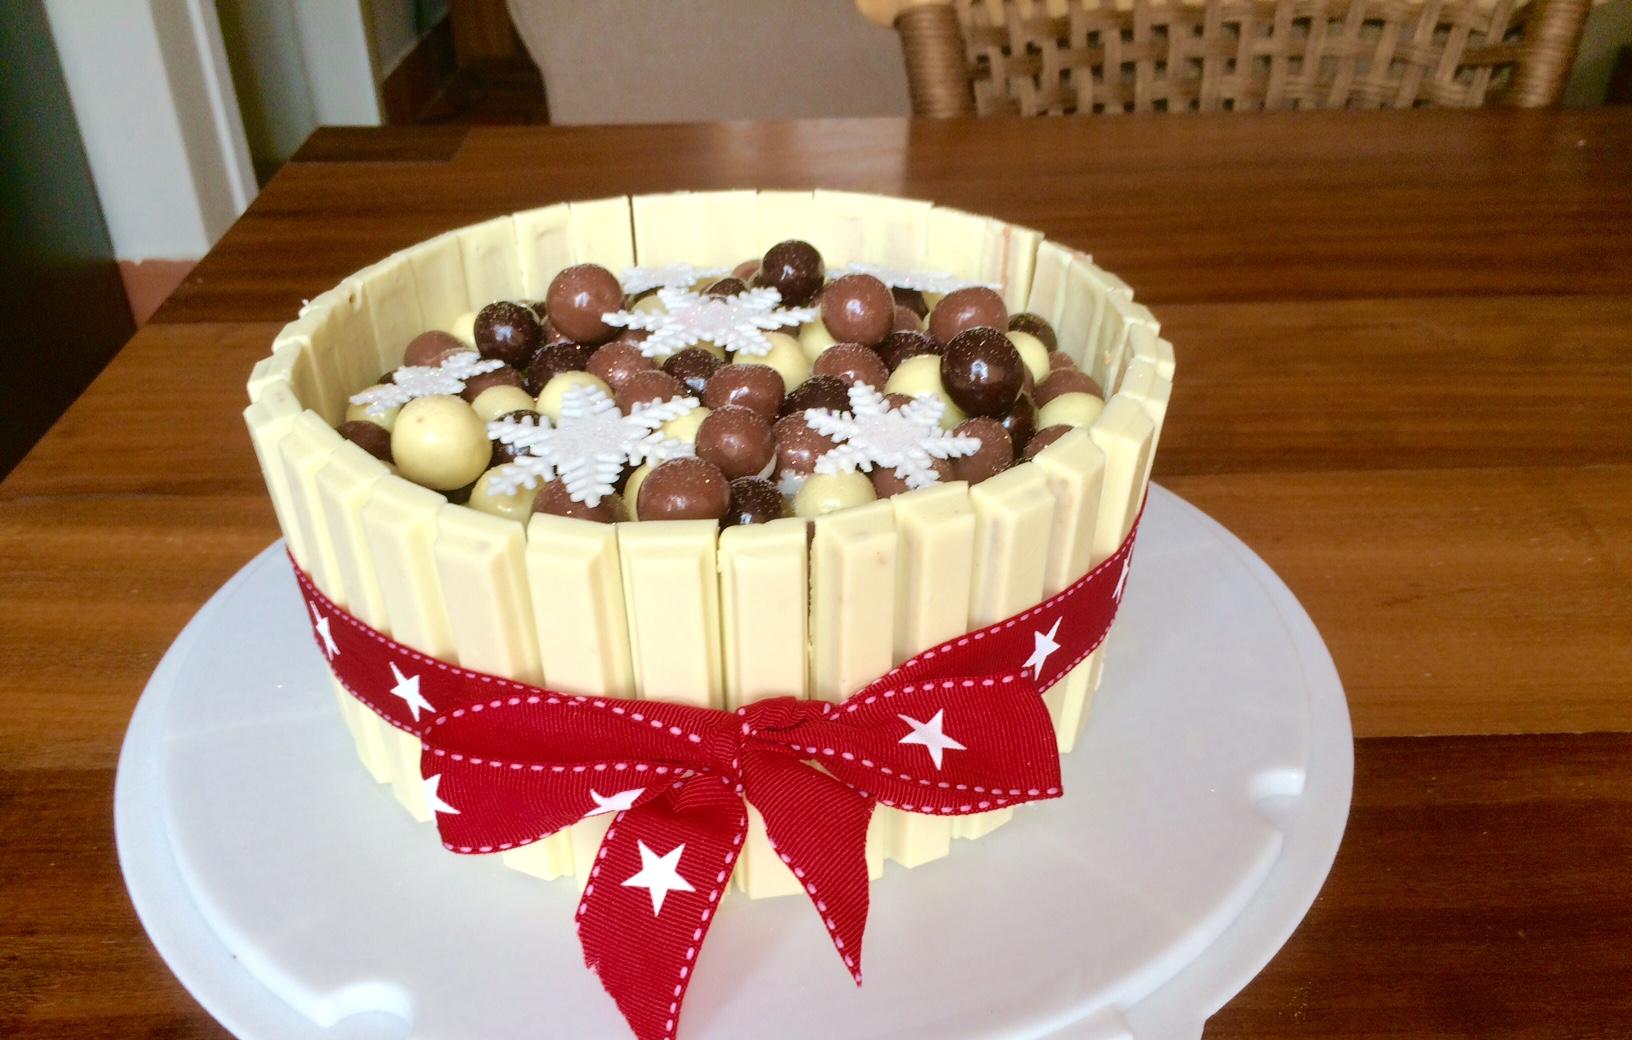 Ridiculously Ravishing Red Velvet Celebration Cake